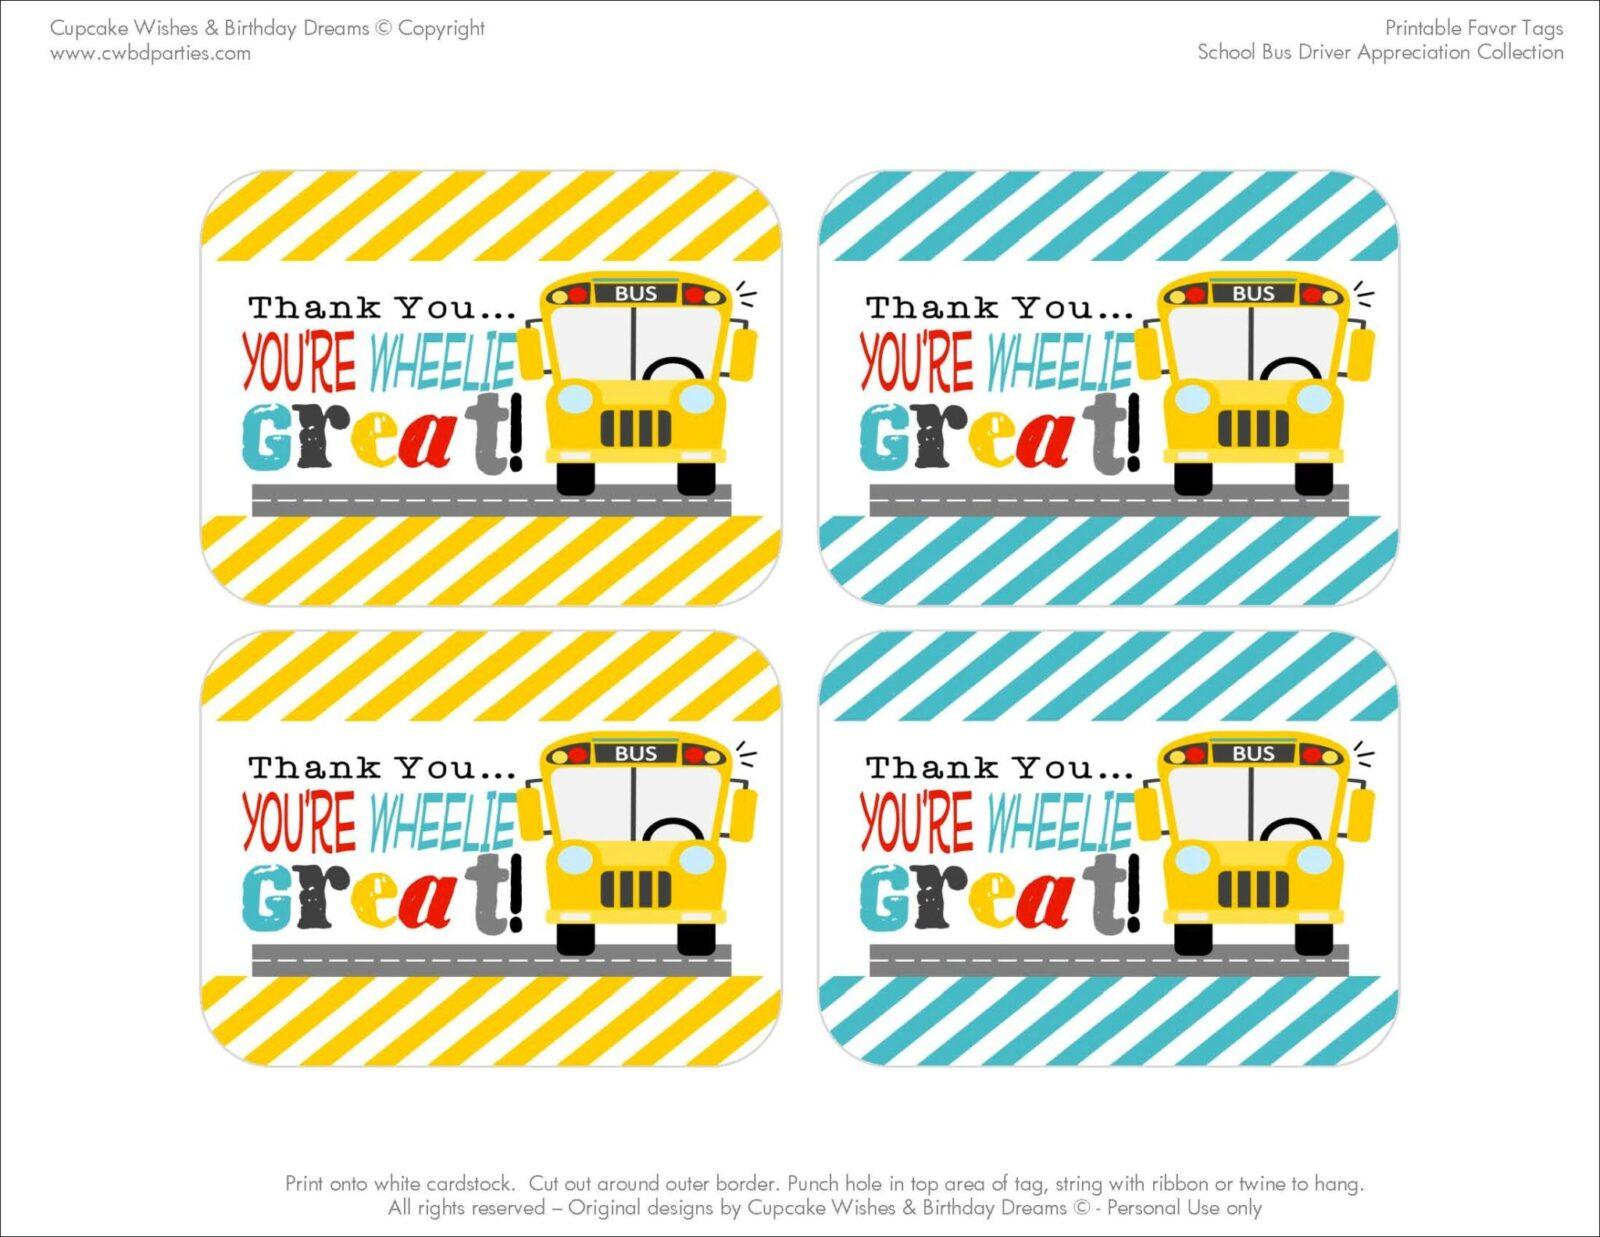 Free Printables School Bus Driver Appreciation The Party Teacher